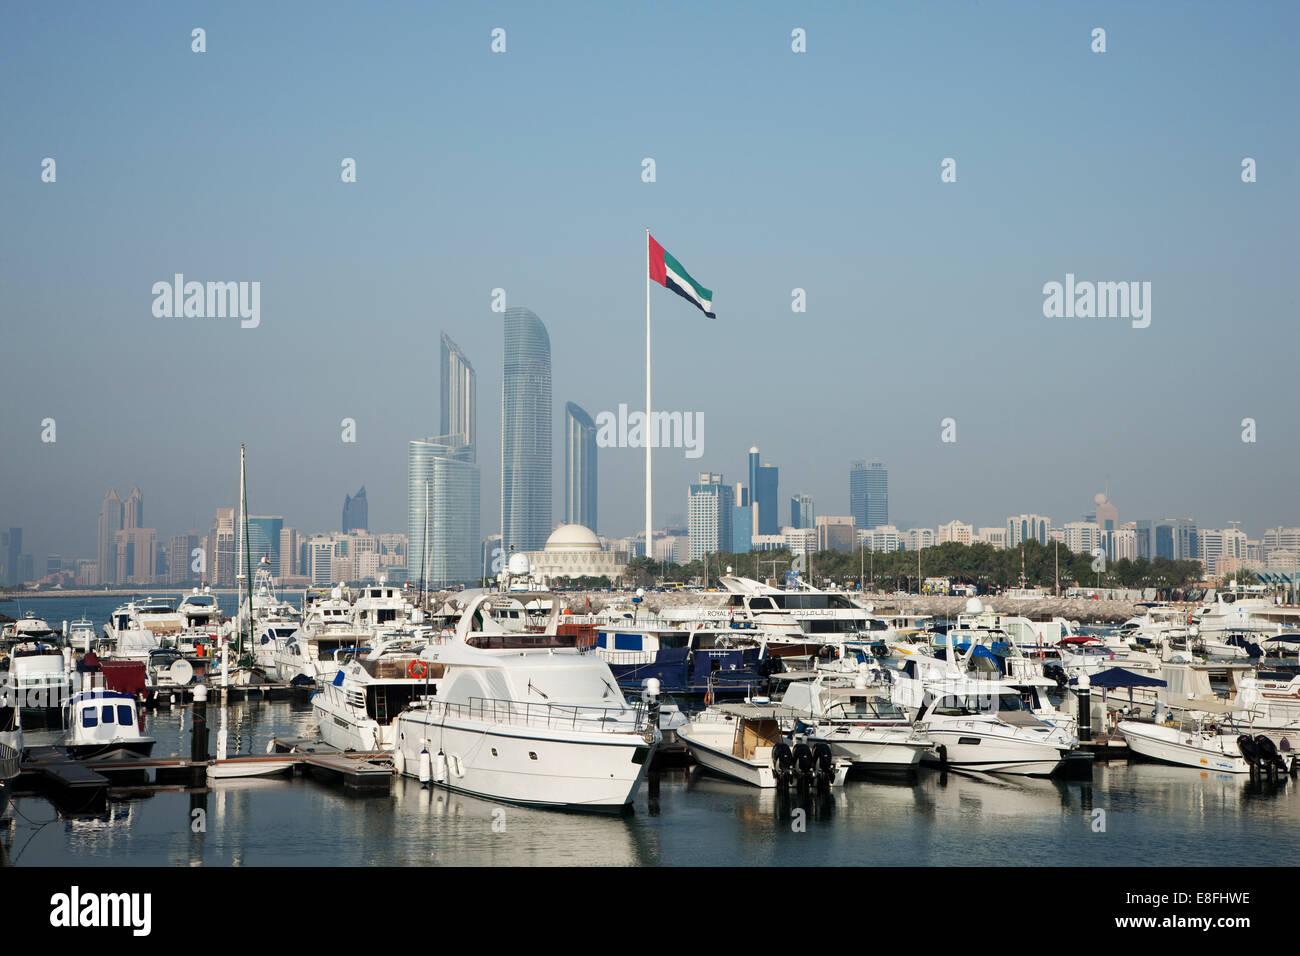 Emirats arabes unis, Abu Dhabi, Skyline avec Harbour en premier plan Photo Stock